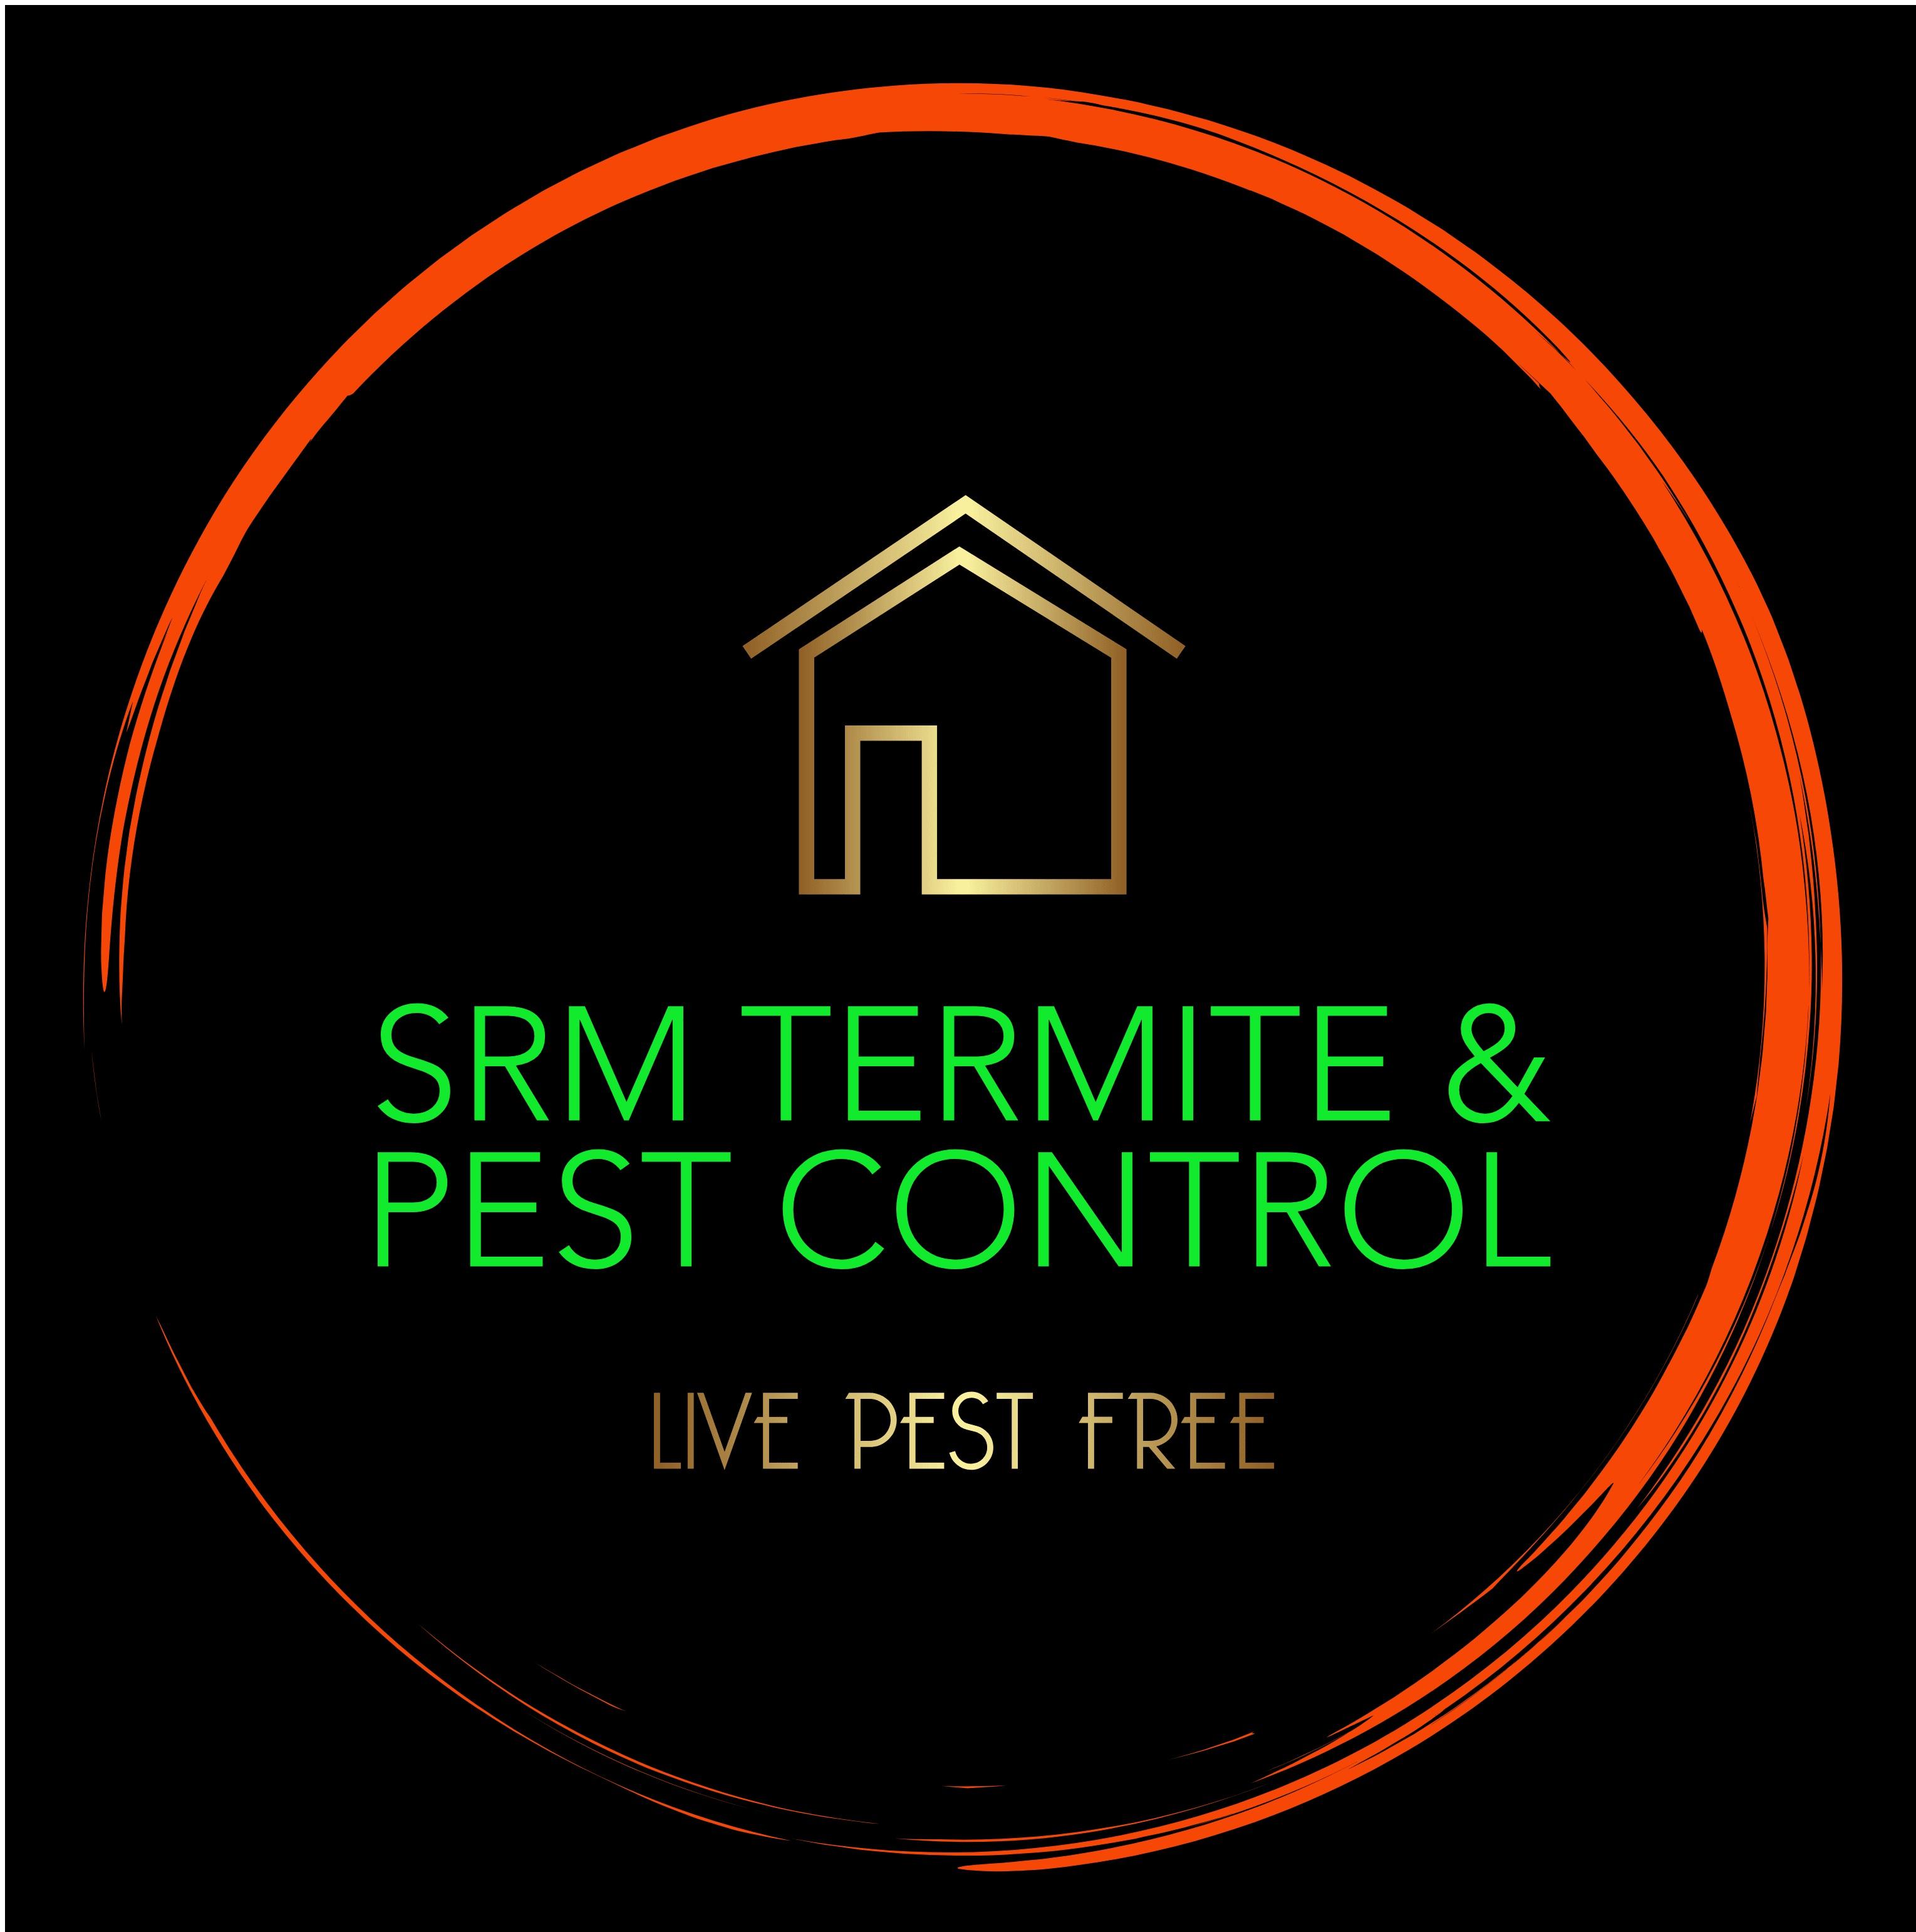 SRM Termite & Pest Control